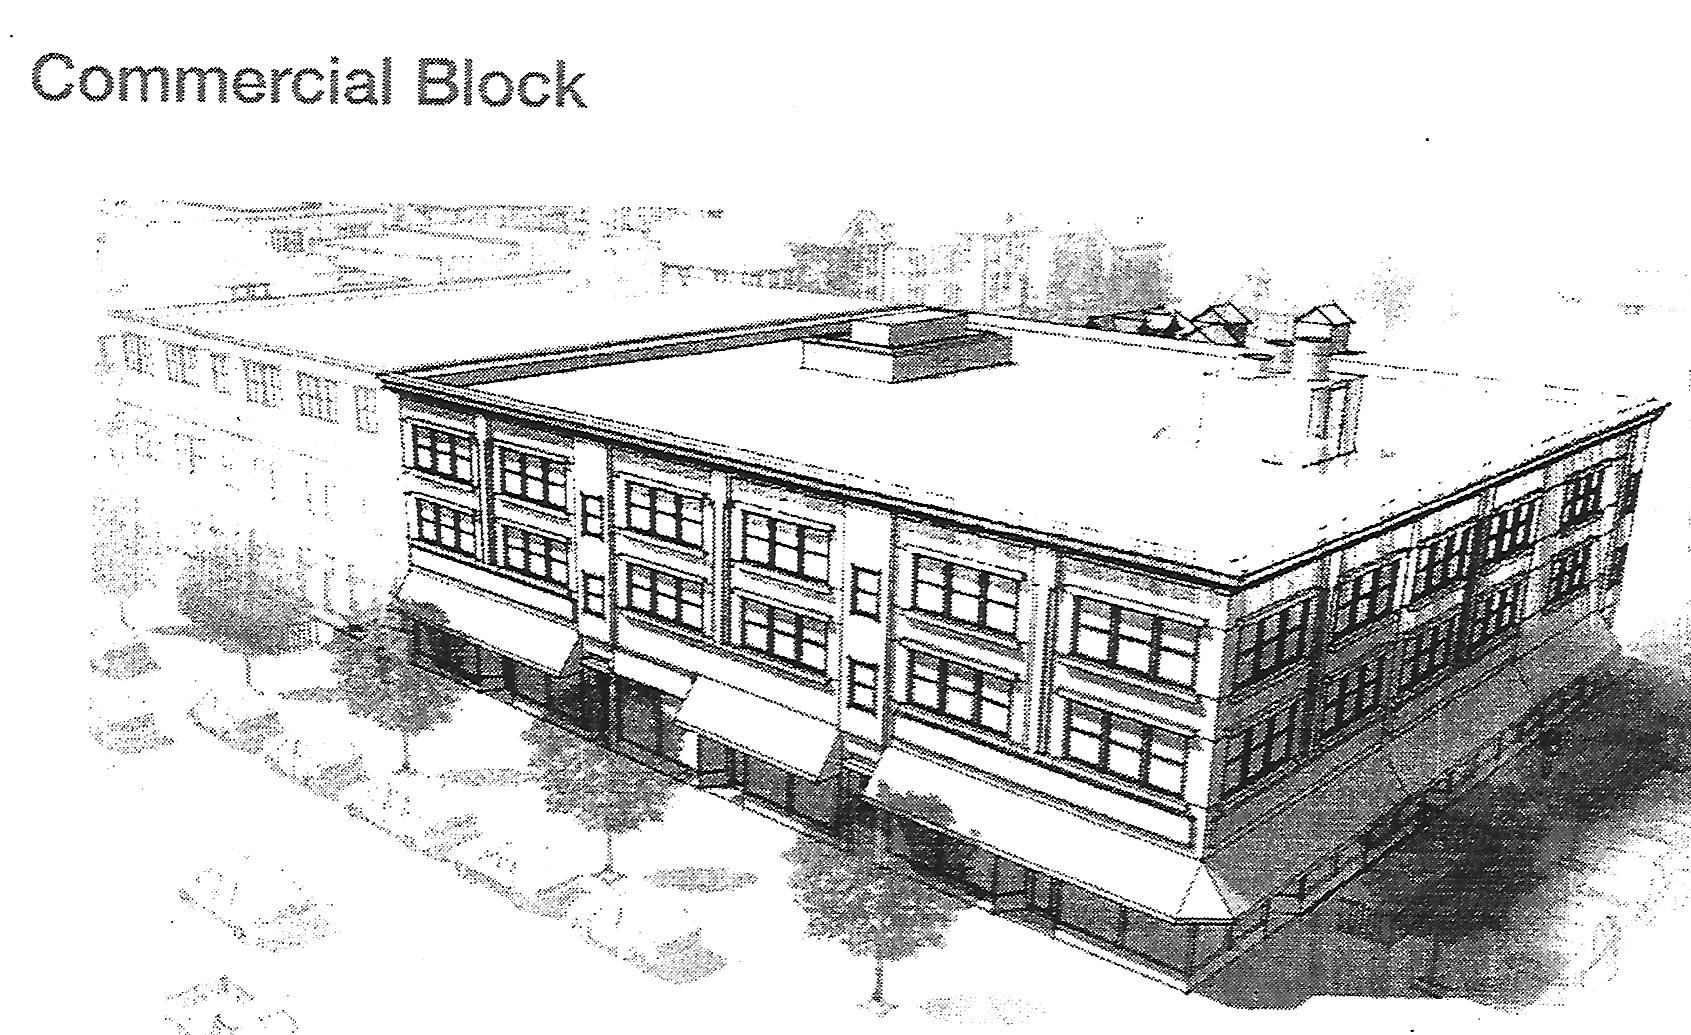 BGC Commercial Block dark0001